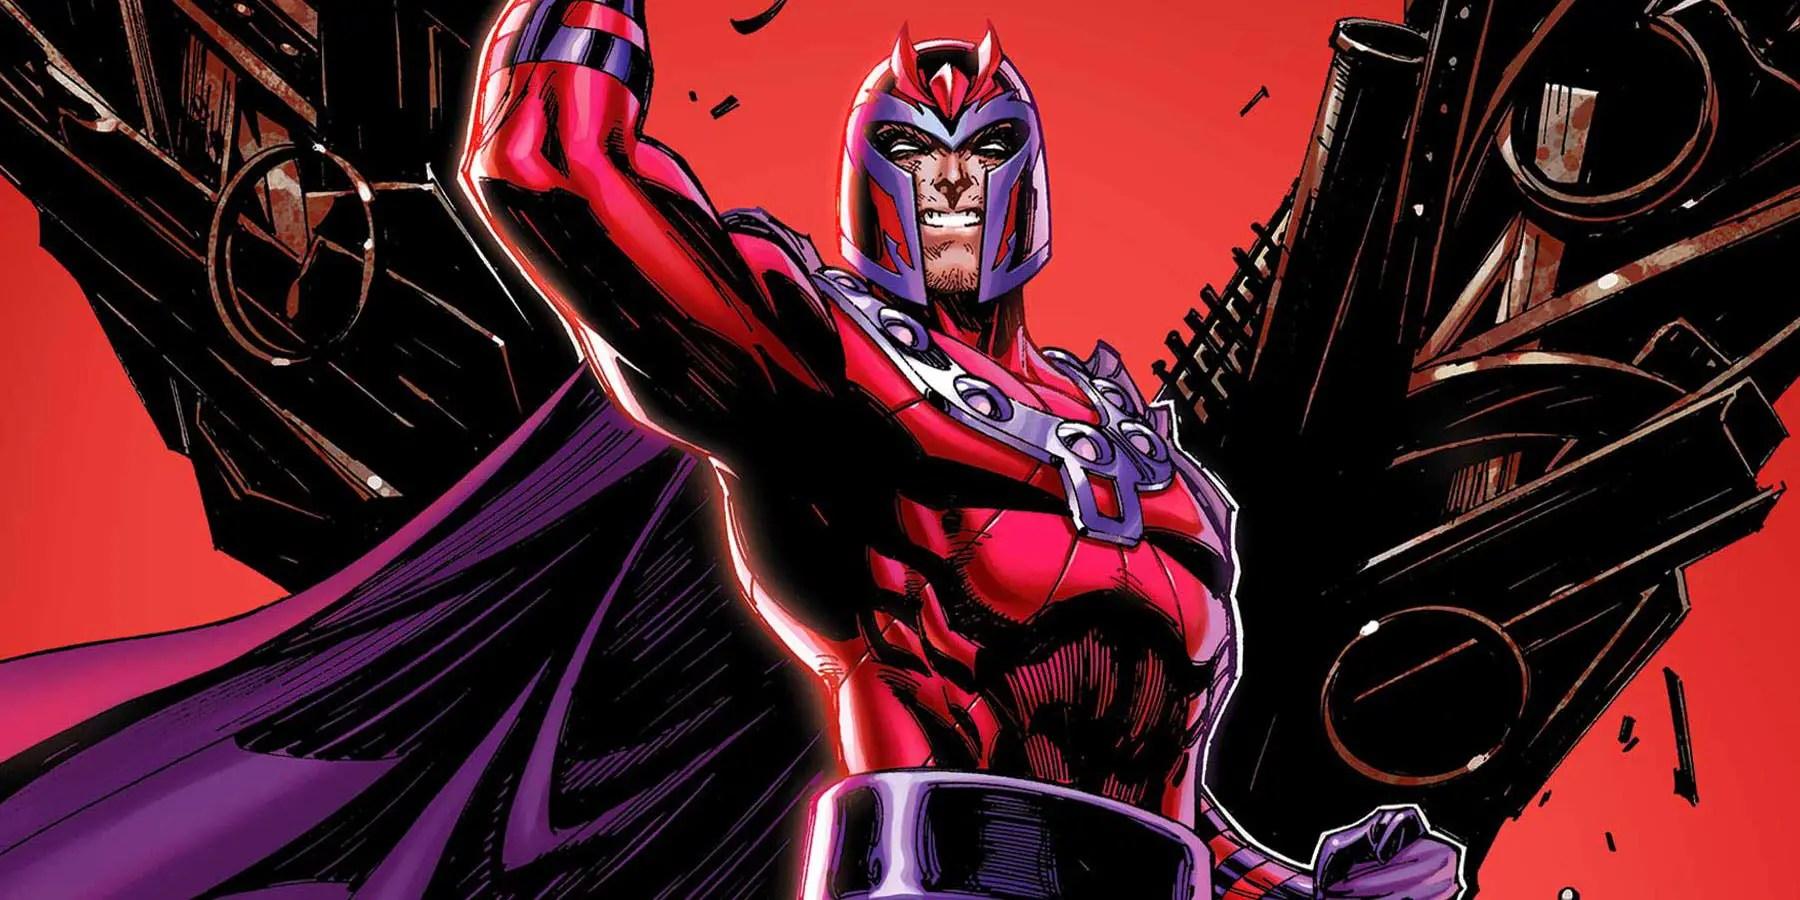 X-Men Black: Magneto #1 review: The start of something big?